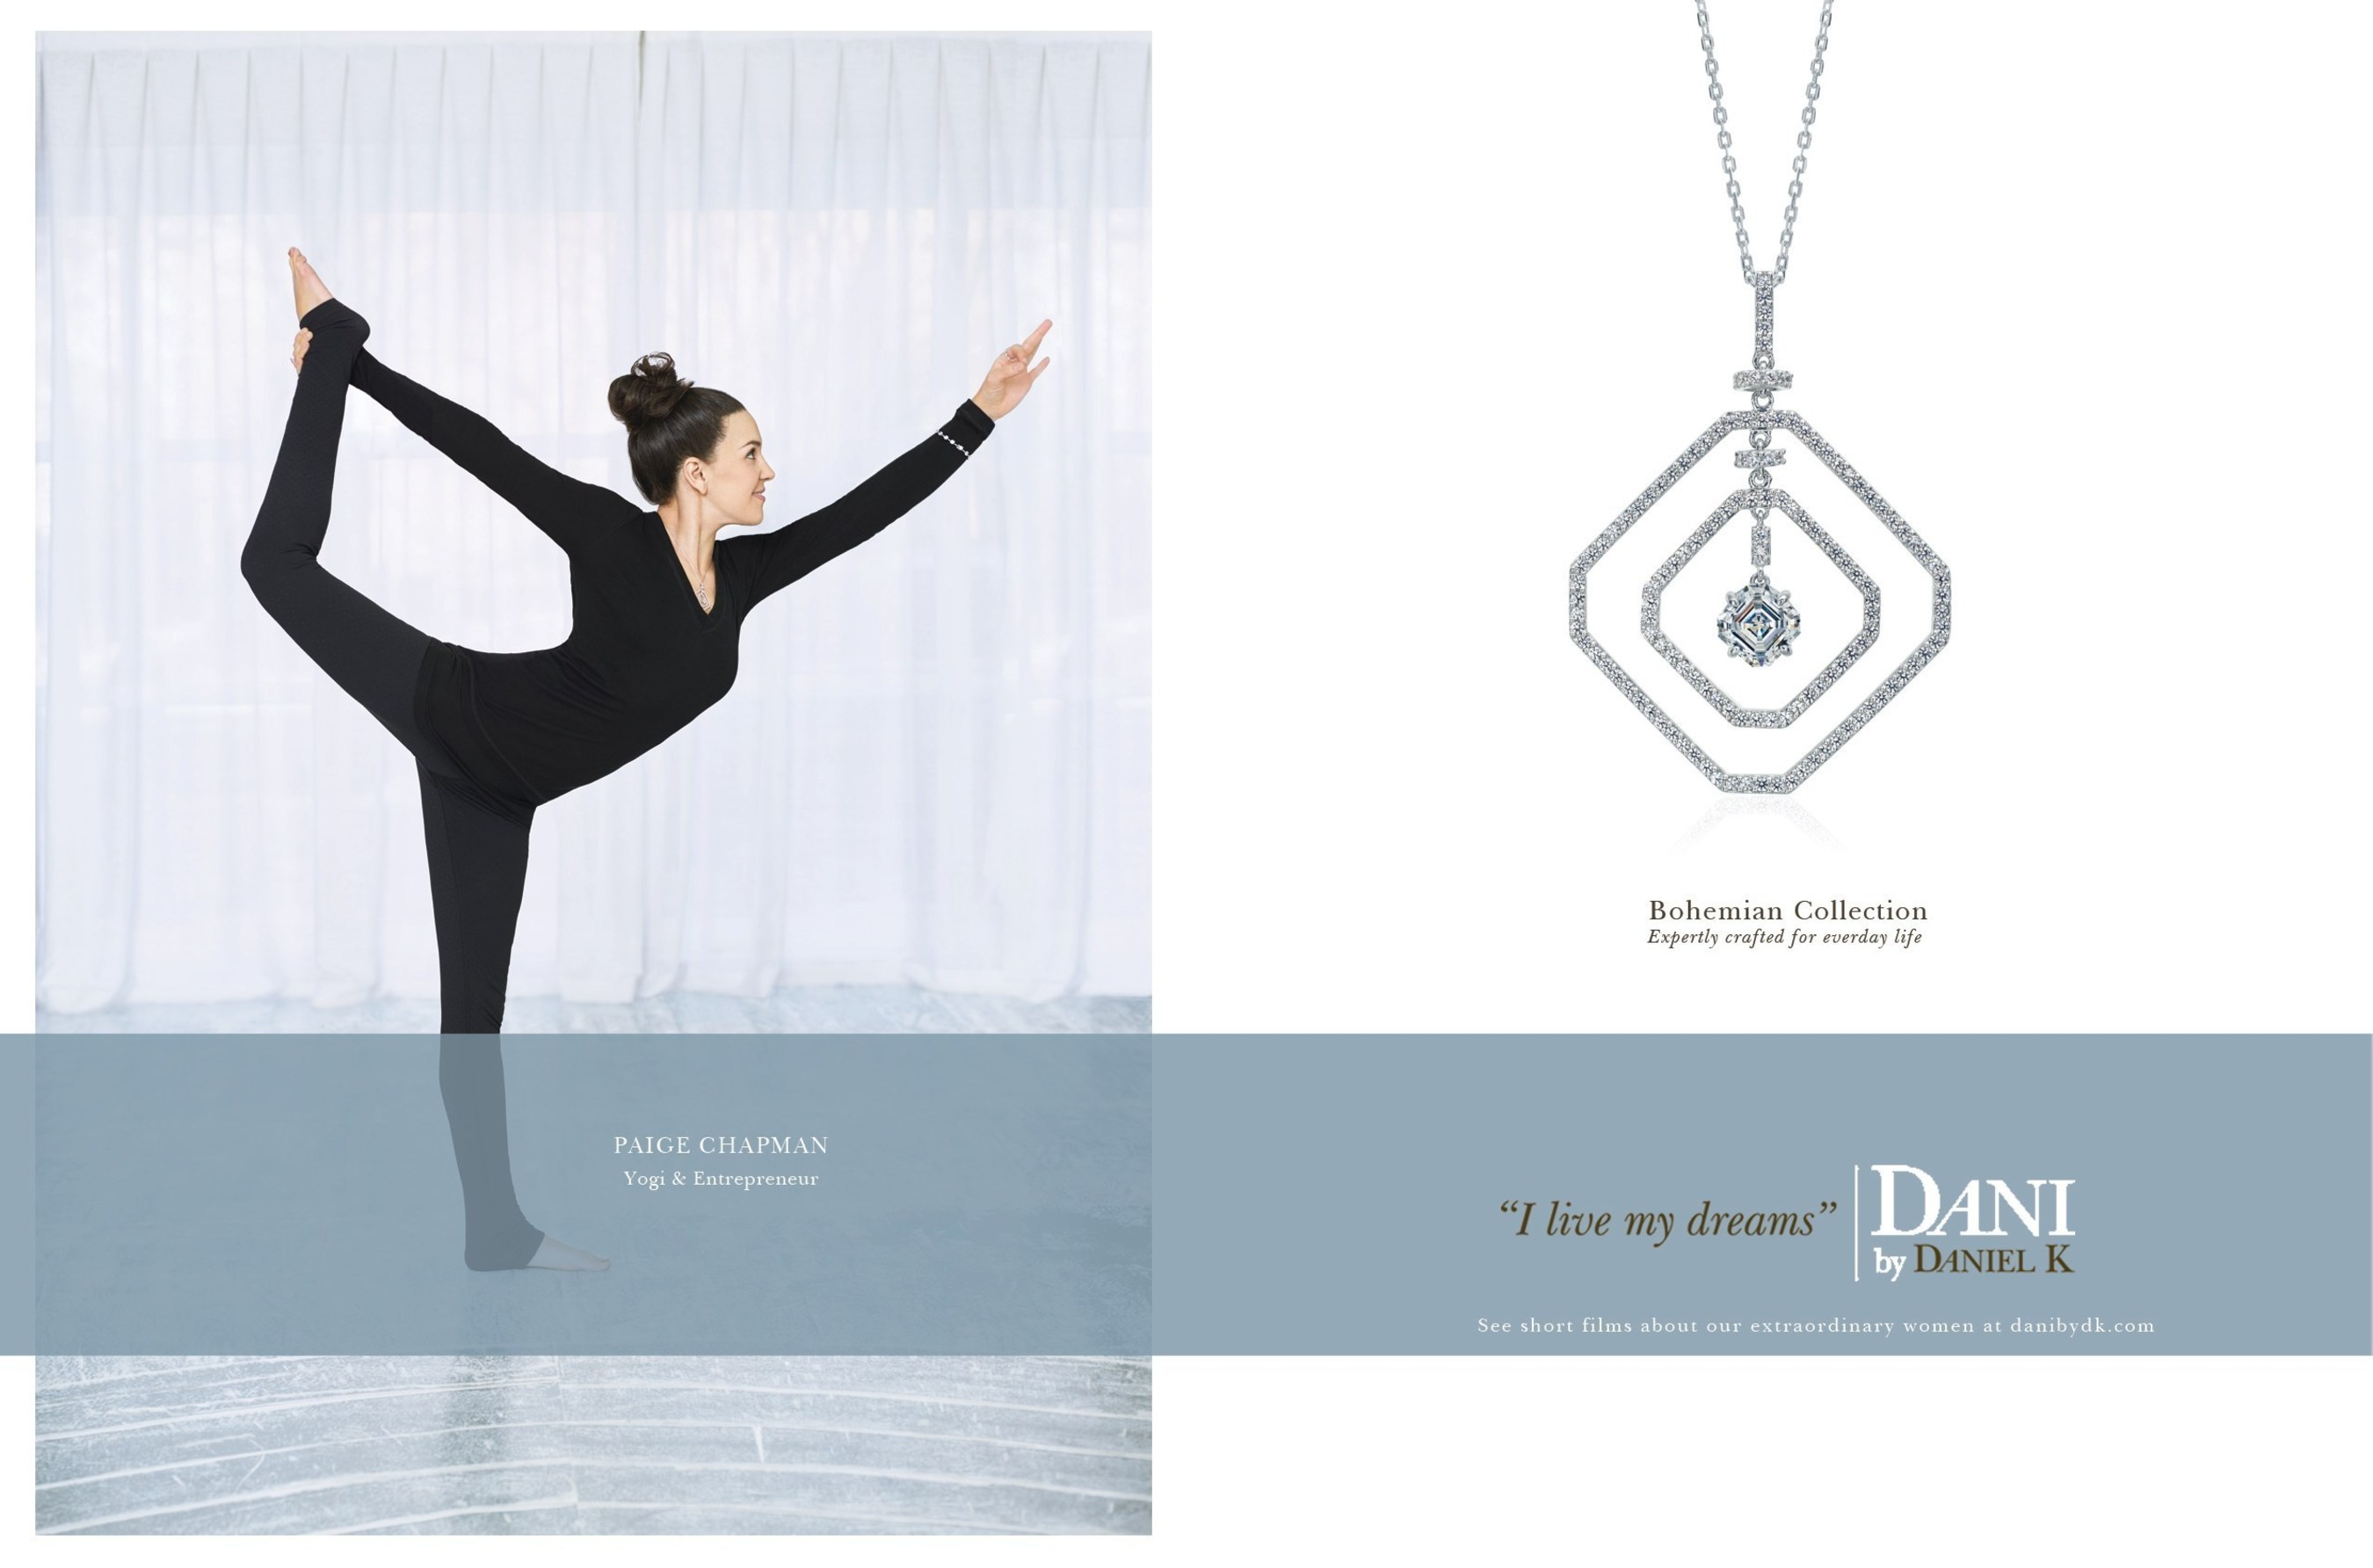 DANI by Daniel K startet auf der Baselworld 2015 eine Multimedia-Reality-Kampagne